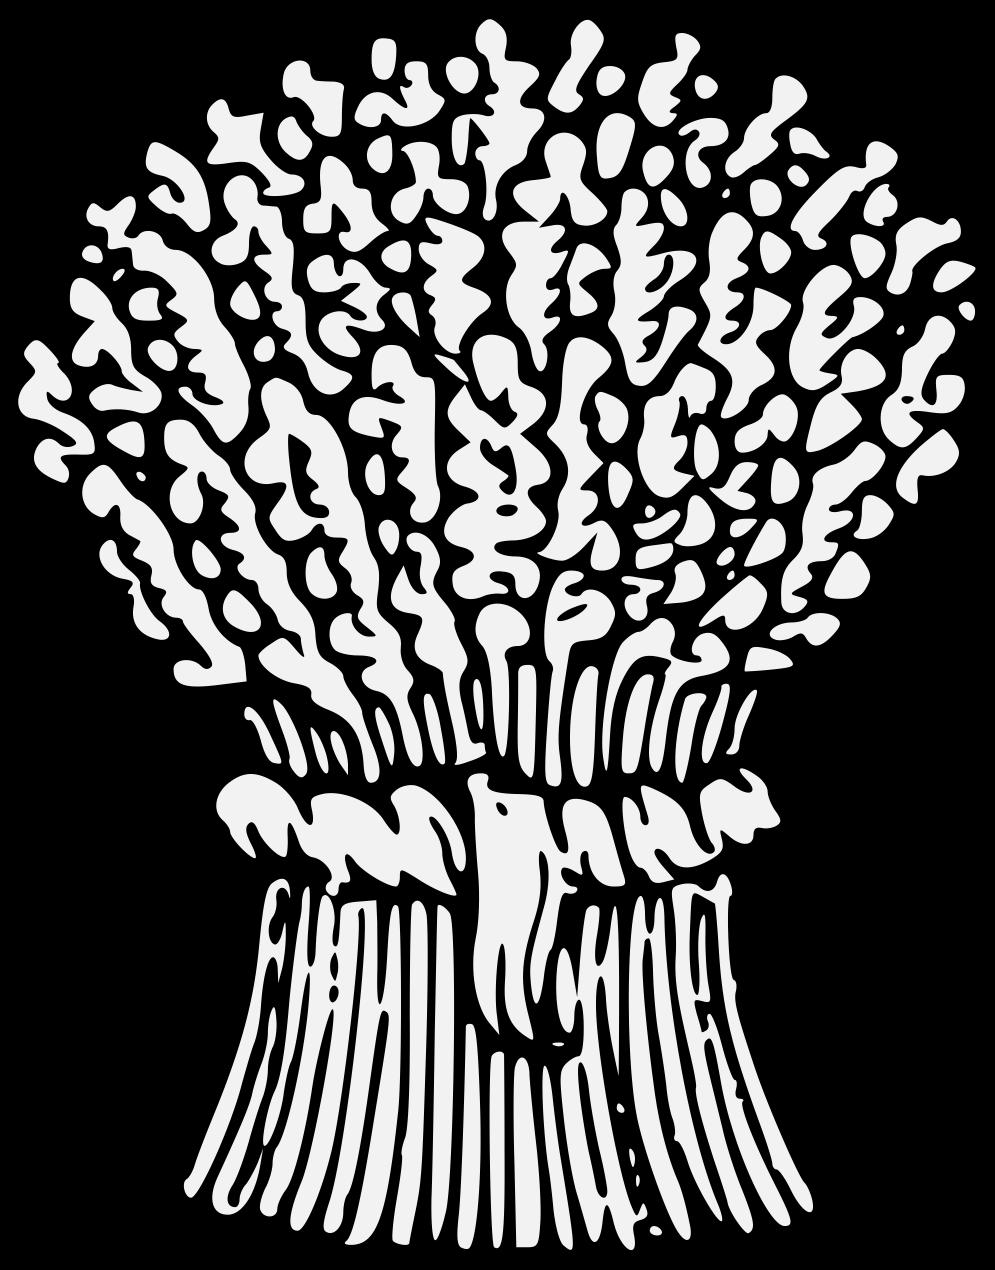 Traceable heraldic art pdf. Grains clipart wheat stem